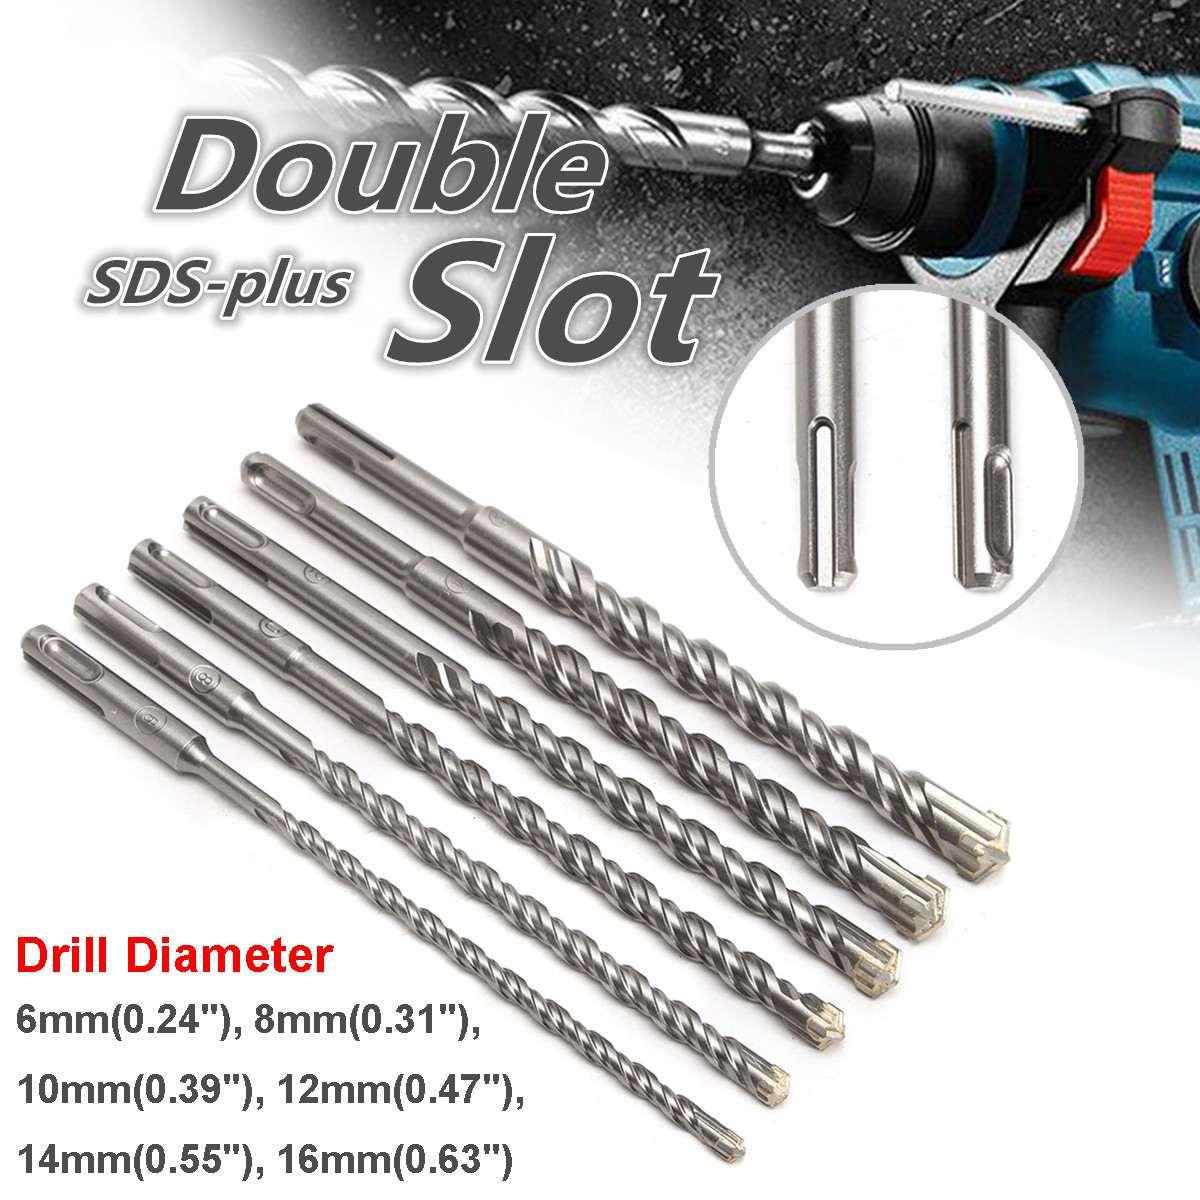 260mm Electric Hammer Drill Bits 6/8/10/12/14/16mm Bi-Metal Cross Type Tungsten Steel Alloy SDS Plus For Masonry Concrete Rock